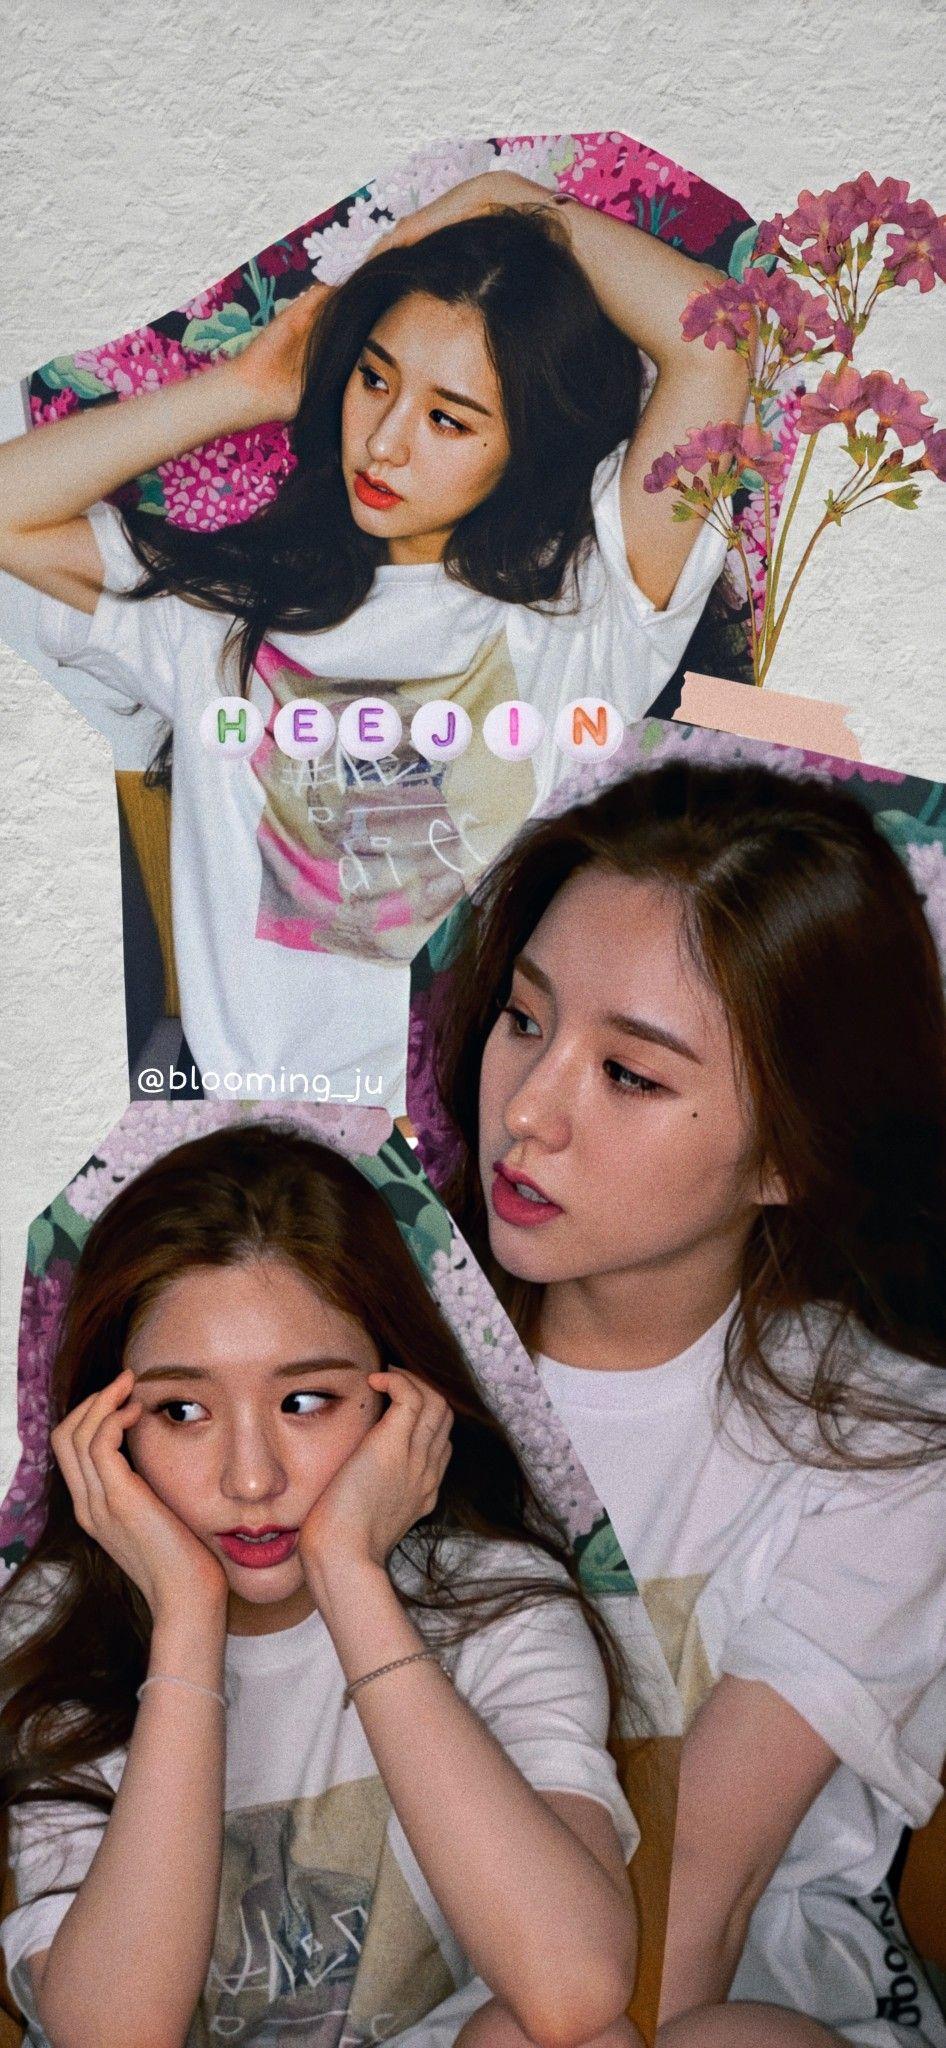 Loona Heejin Lockscreen Kpop Aesthetic Cute Anime Wallpaper Kpop Wallpaper